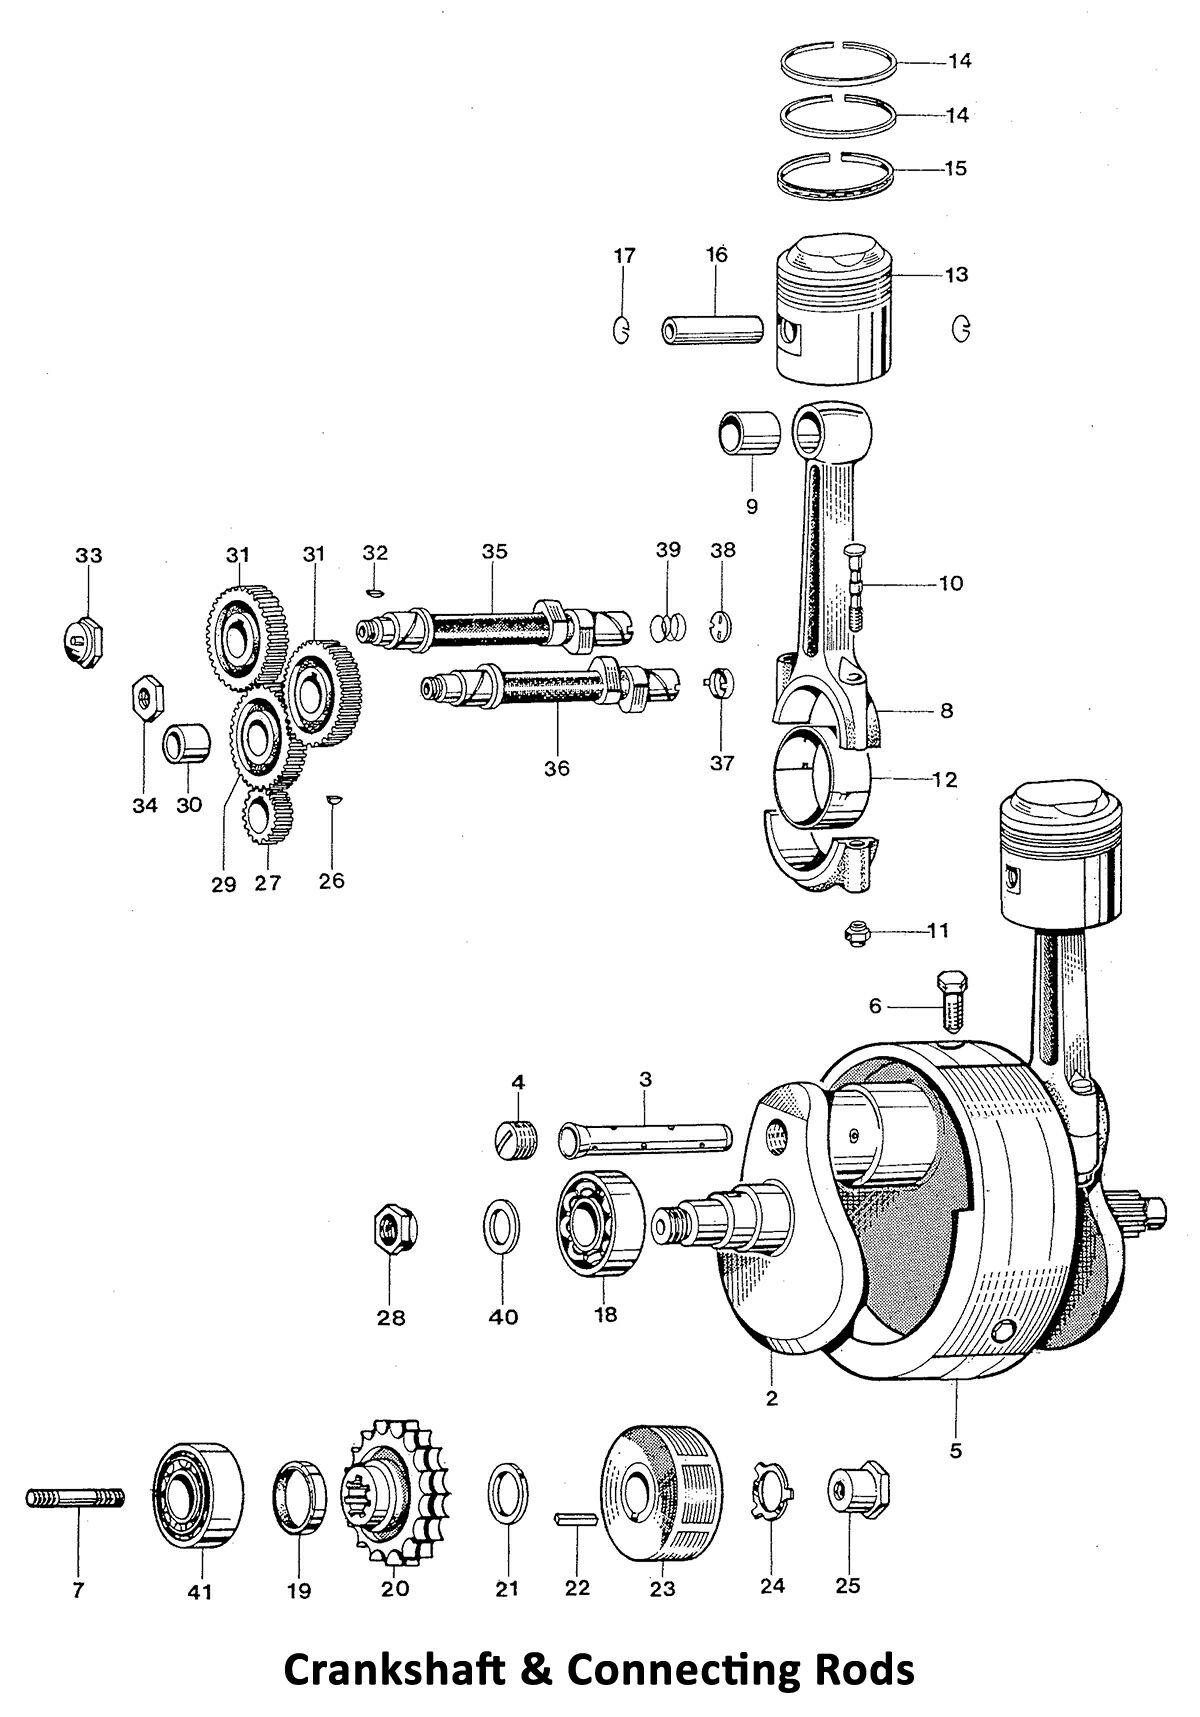 Triumph 650 Twins 1969 Crankshaft and Connecting Rods - Classic Bike Spares